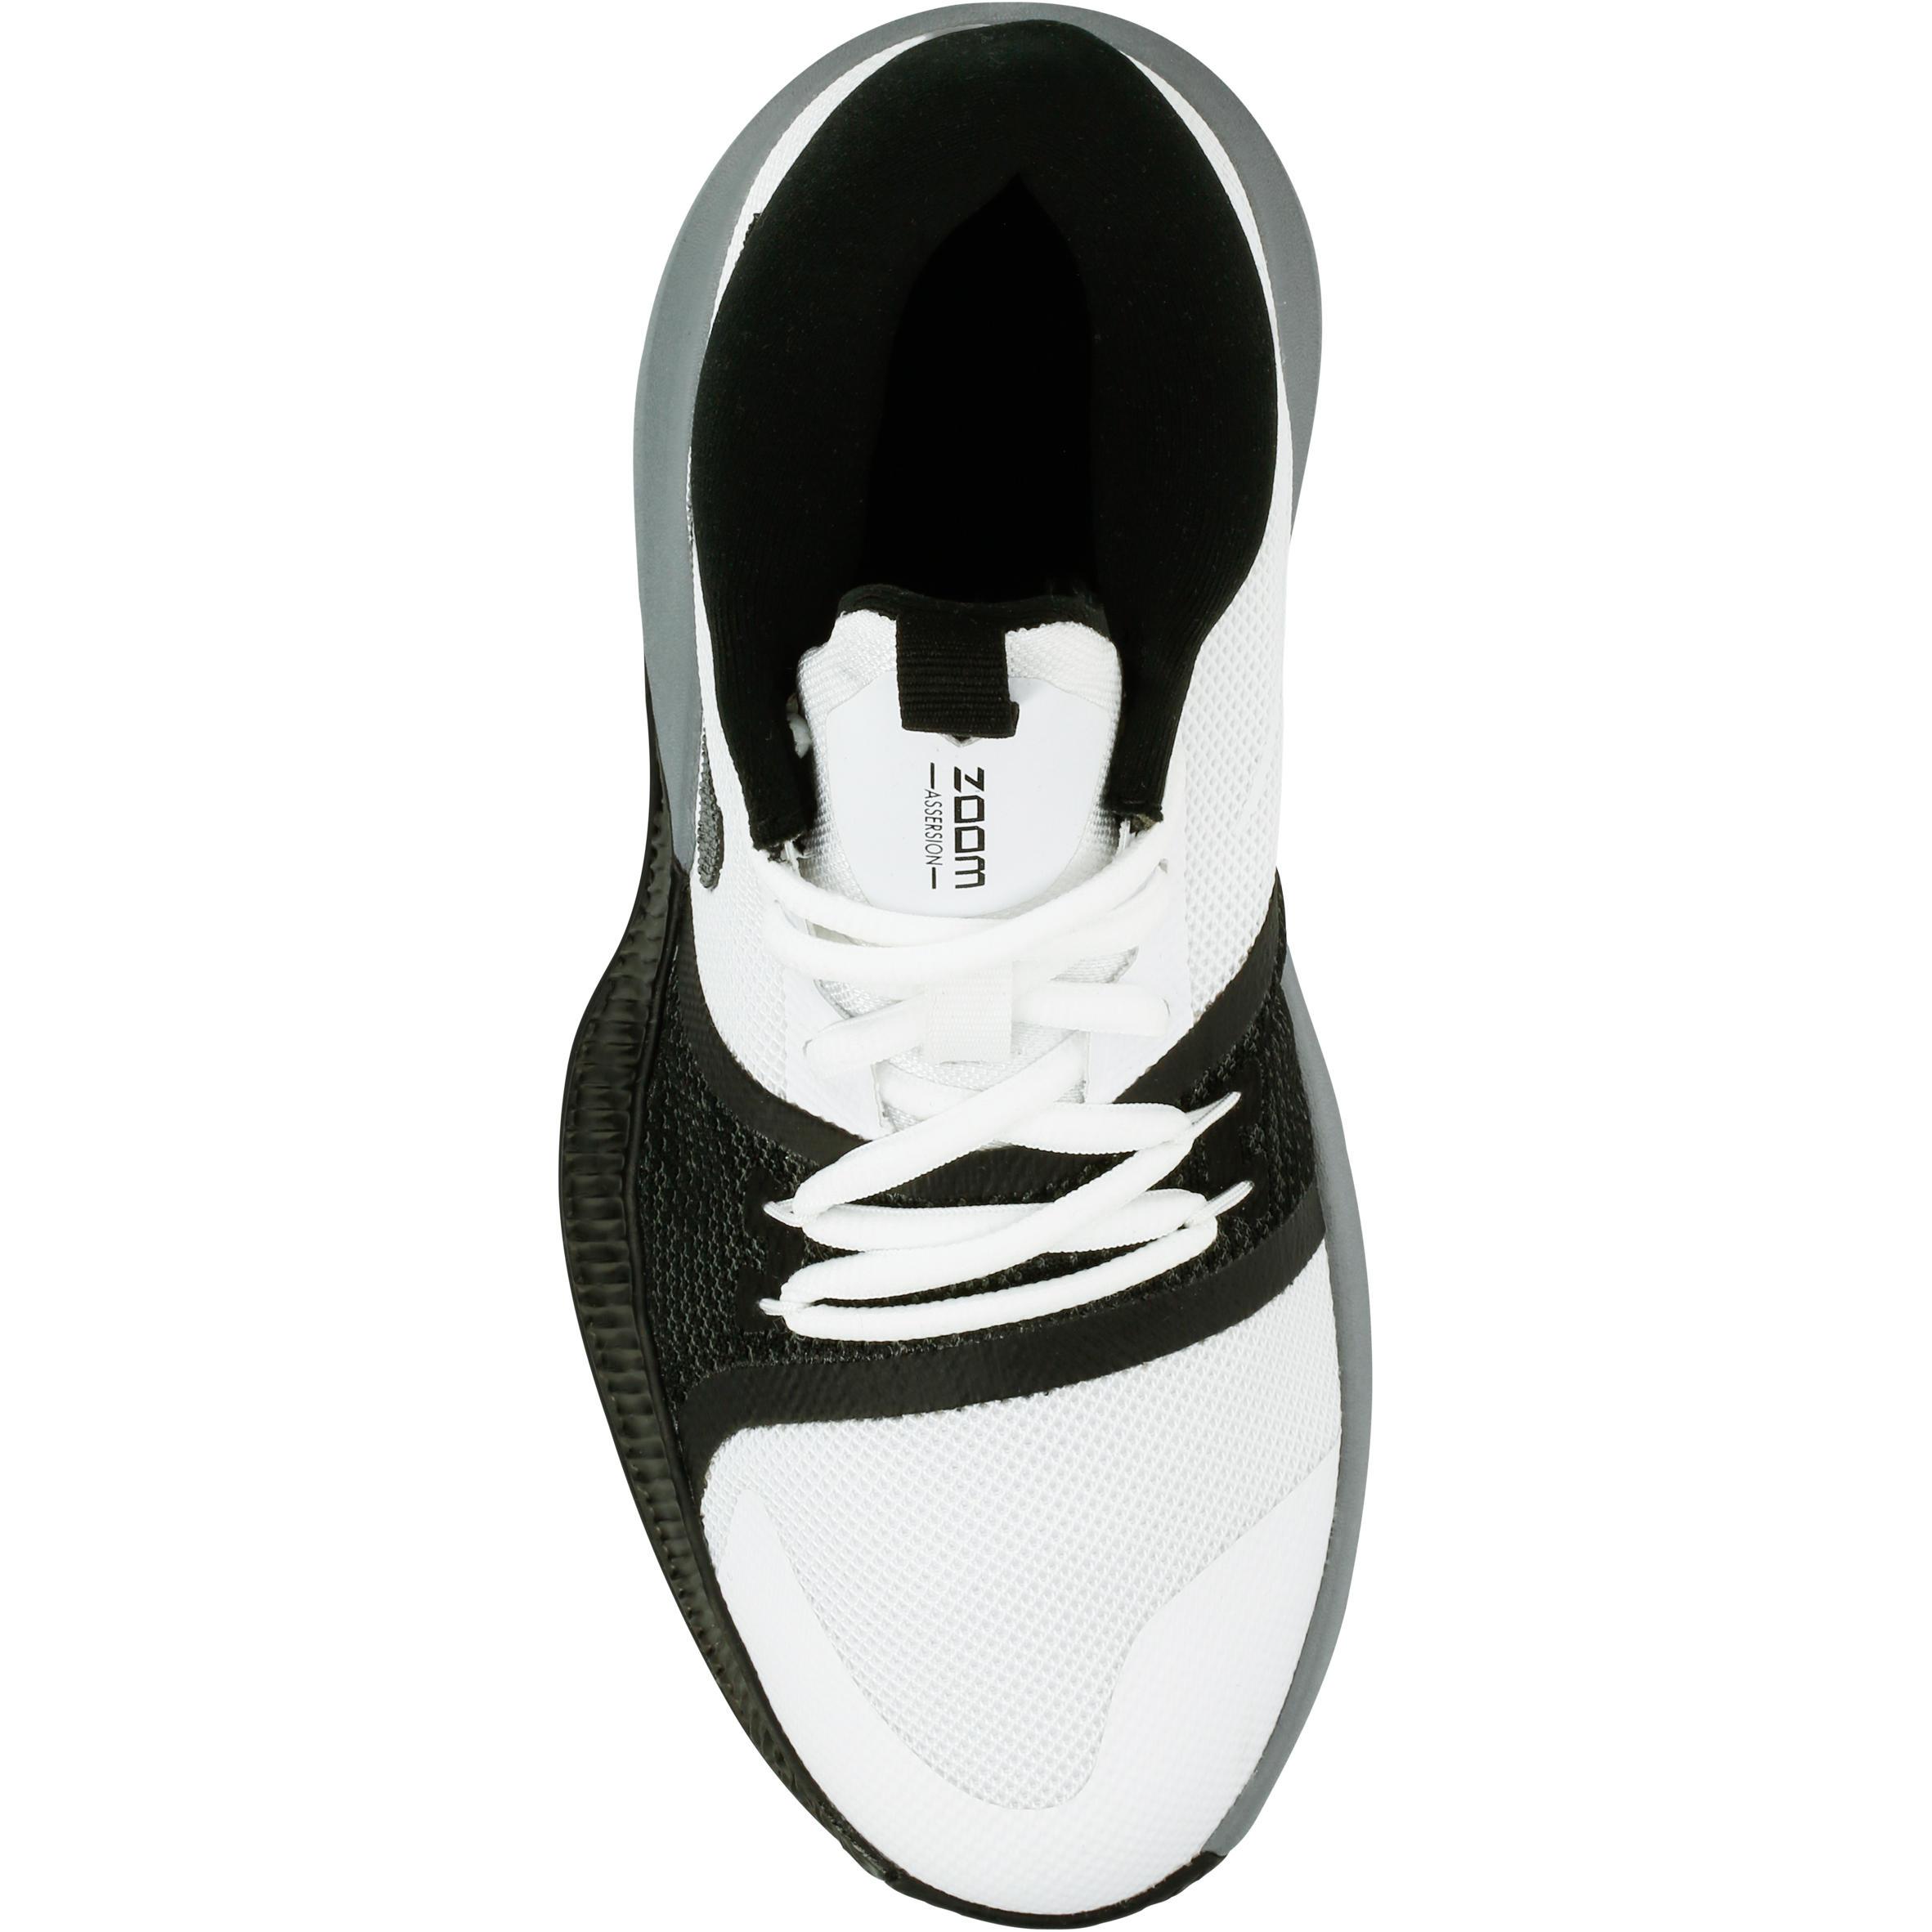 Nike Blanche Chaussure Basketball De Noire Assertion 8oxwkn0p dCxhsQtr